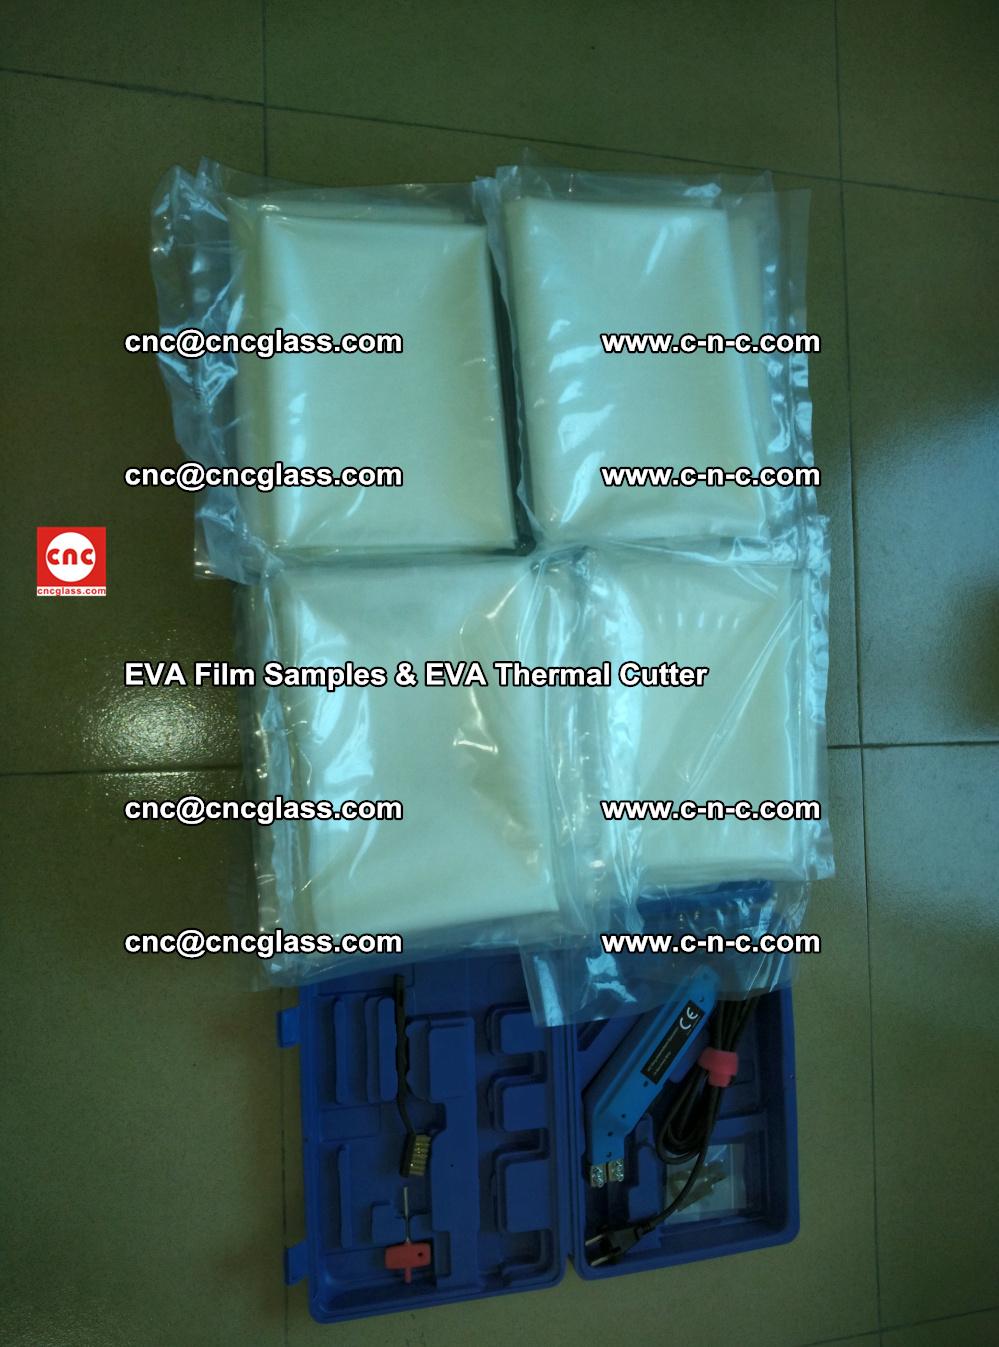 EVAFORCE SUPER CLEAR EVA Film Samples and EVA Thermal Cutter (38)